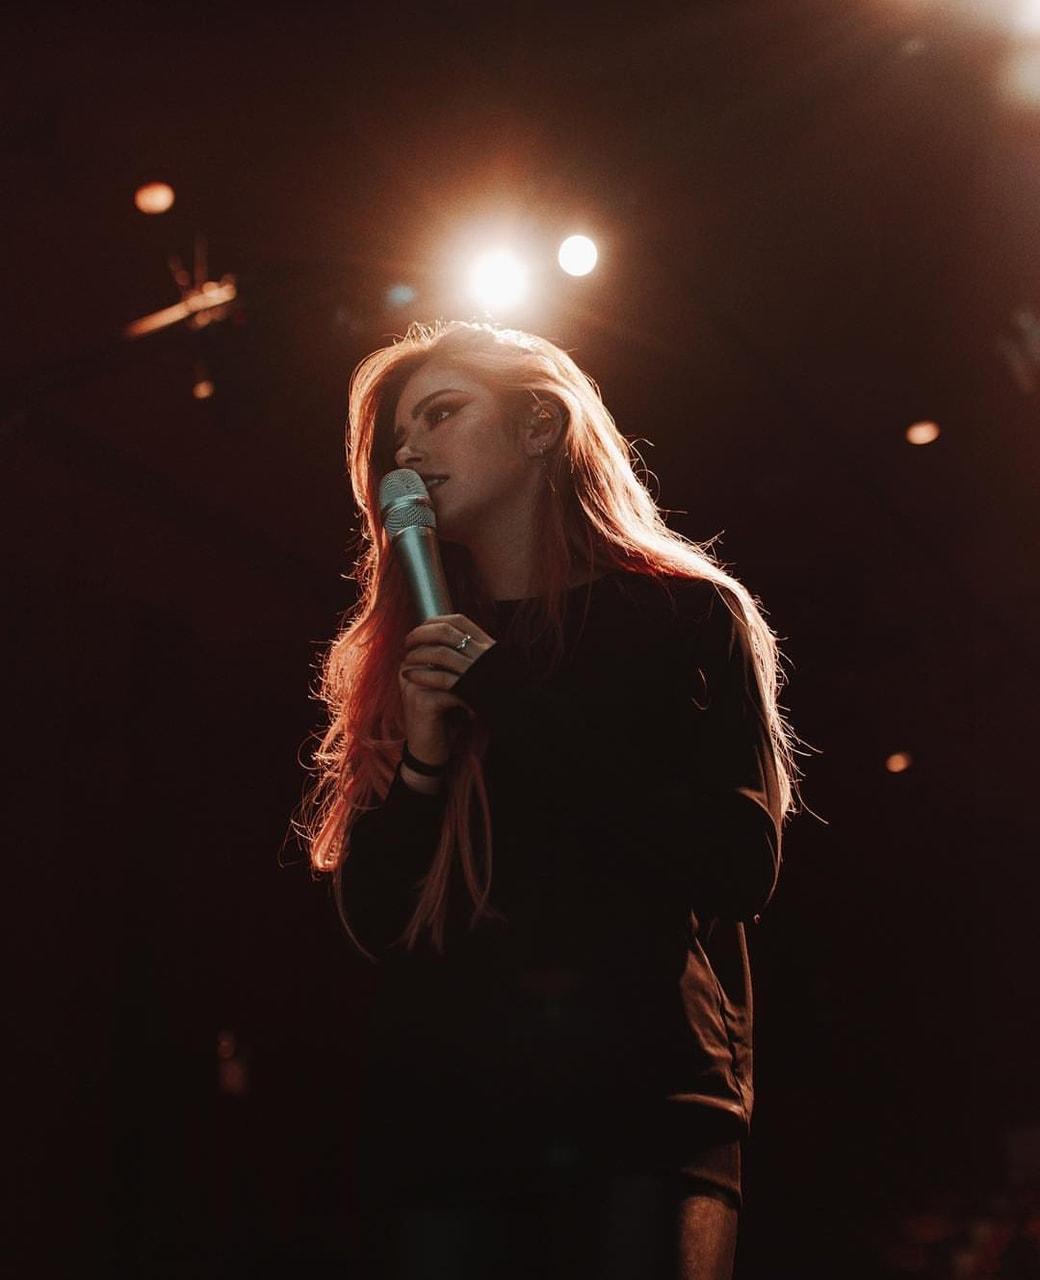 atc, bands, and girls image